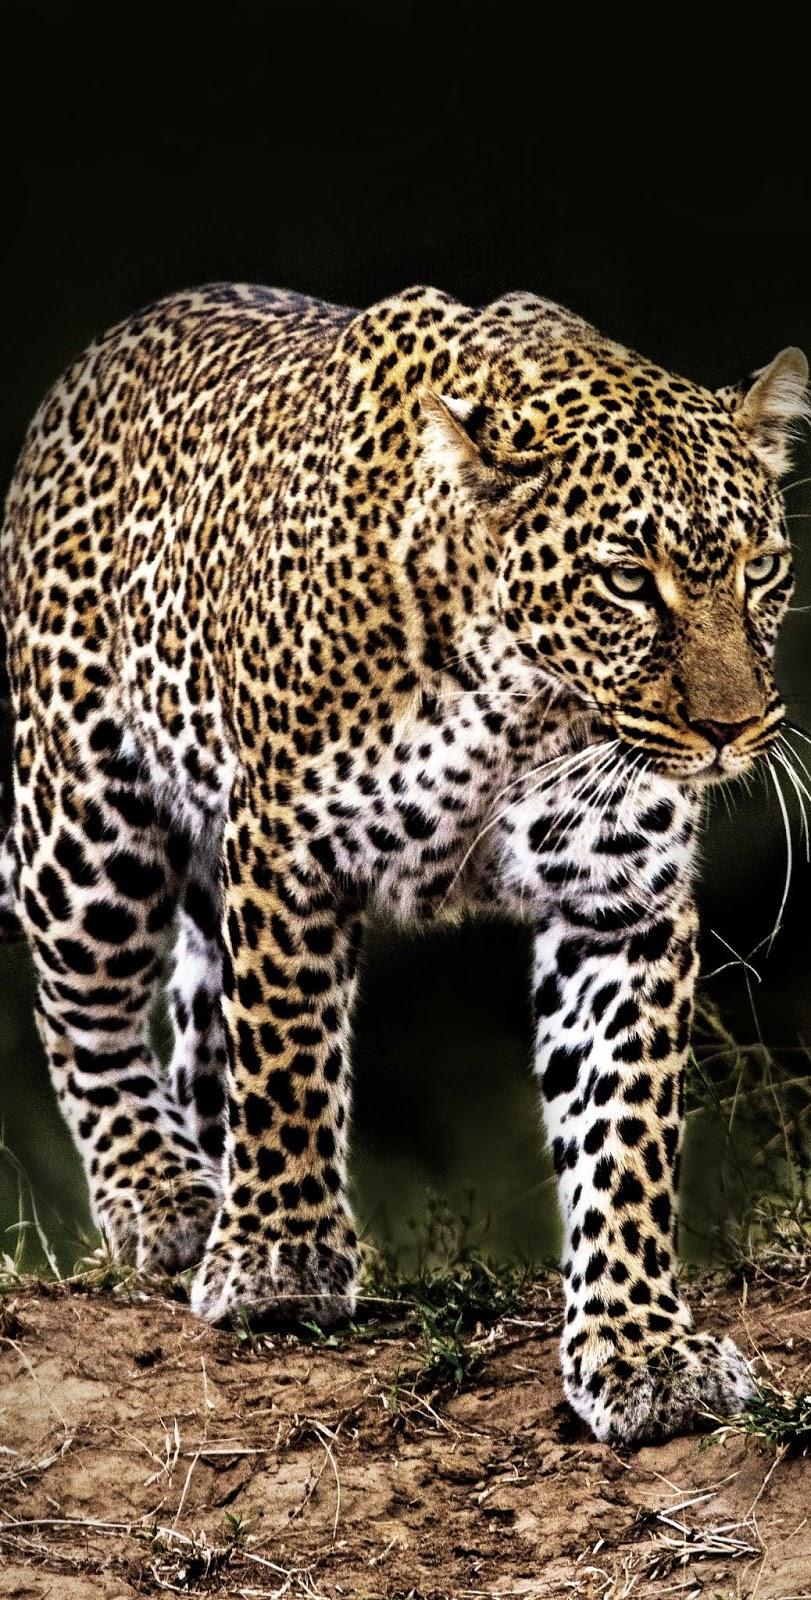 A leopard on night patrol.